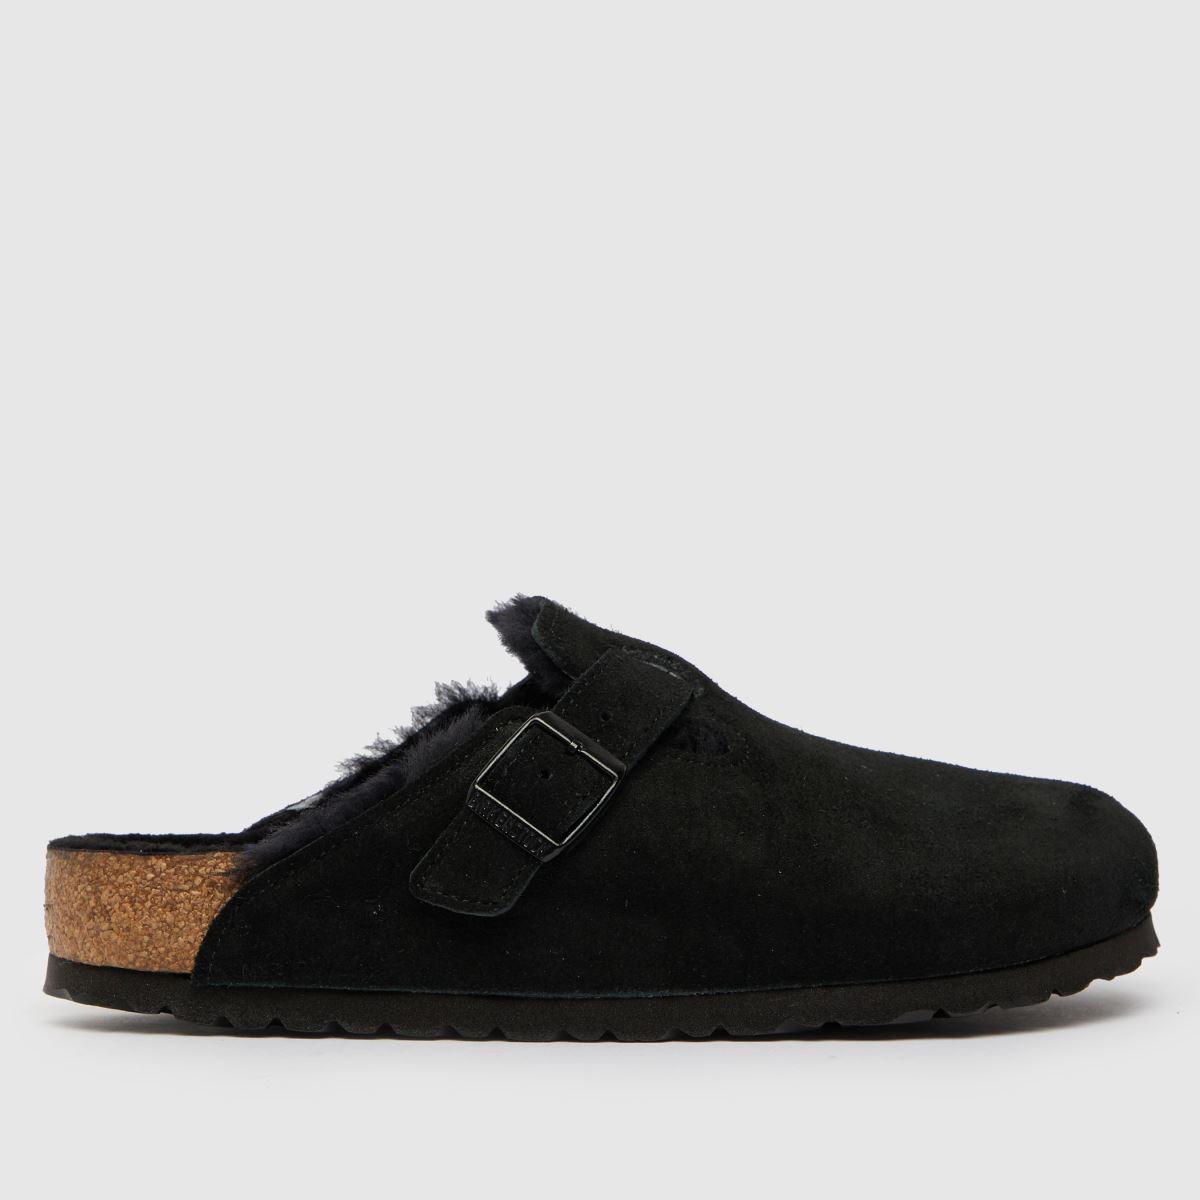 BIRKENSTOCK Black Boston Shearling Sandals